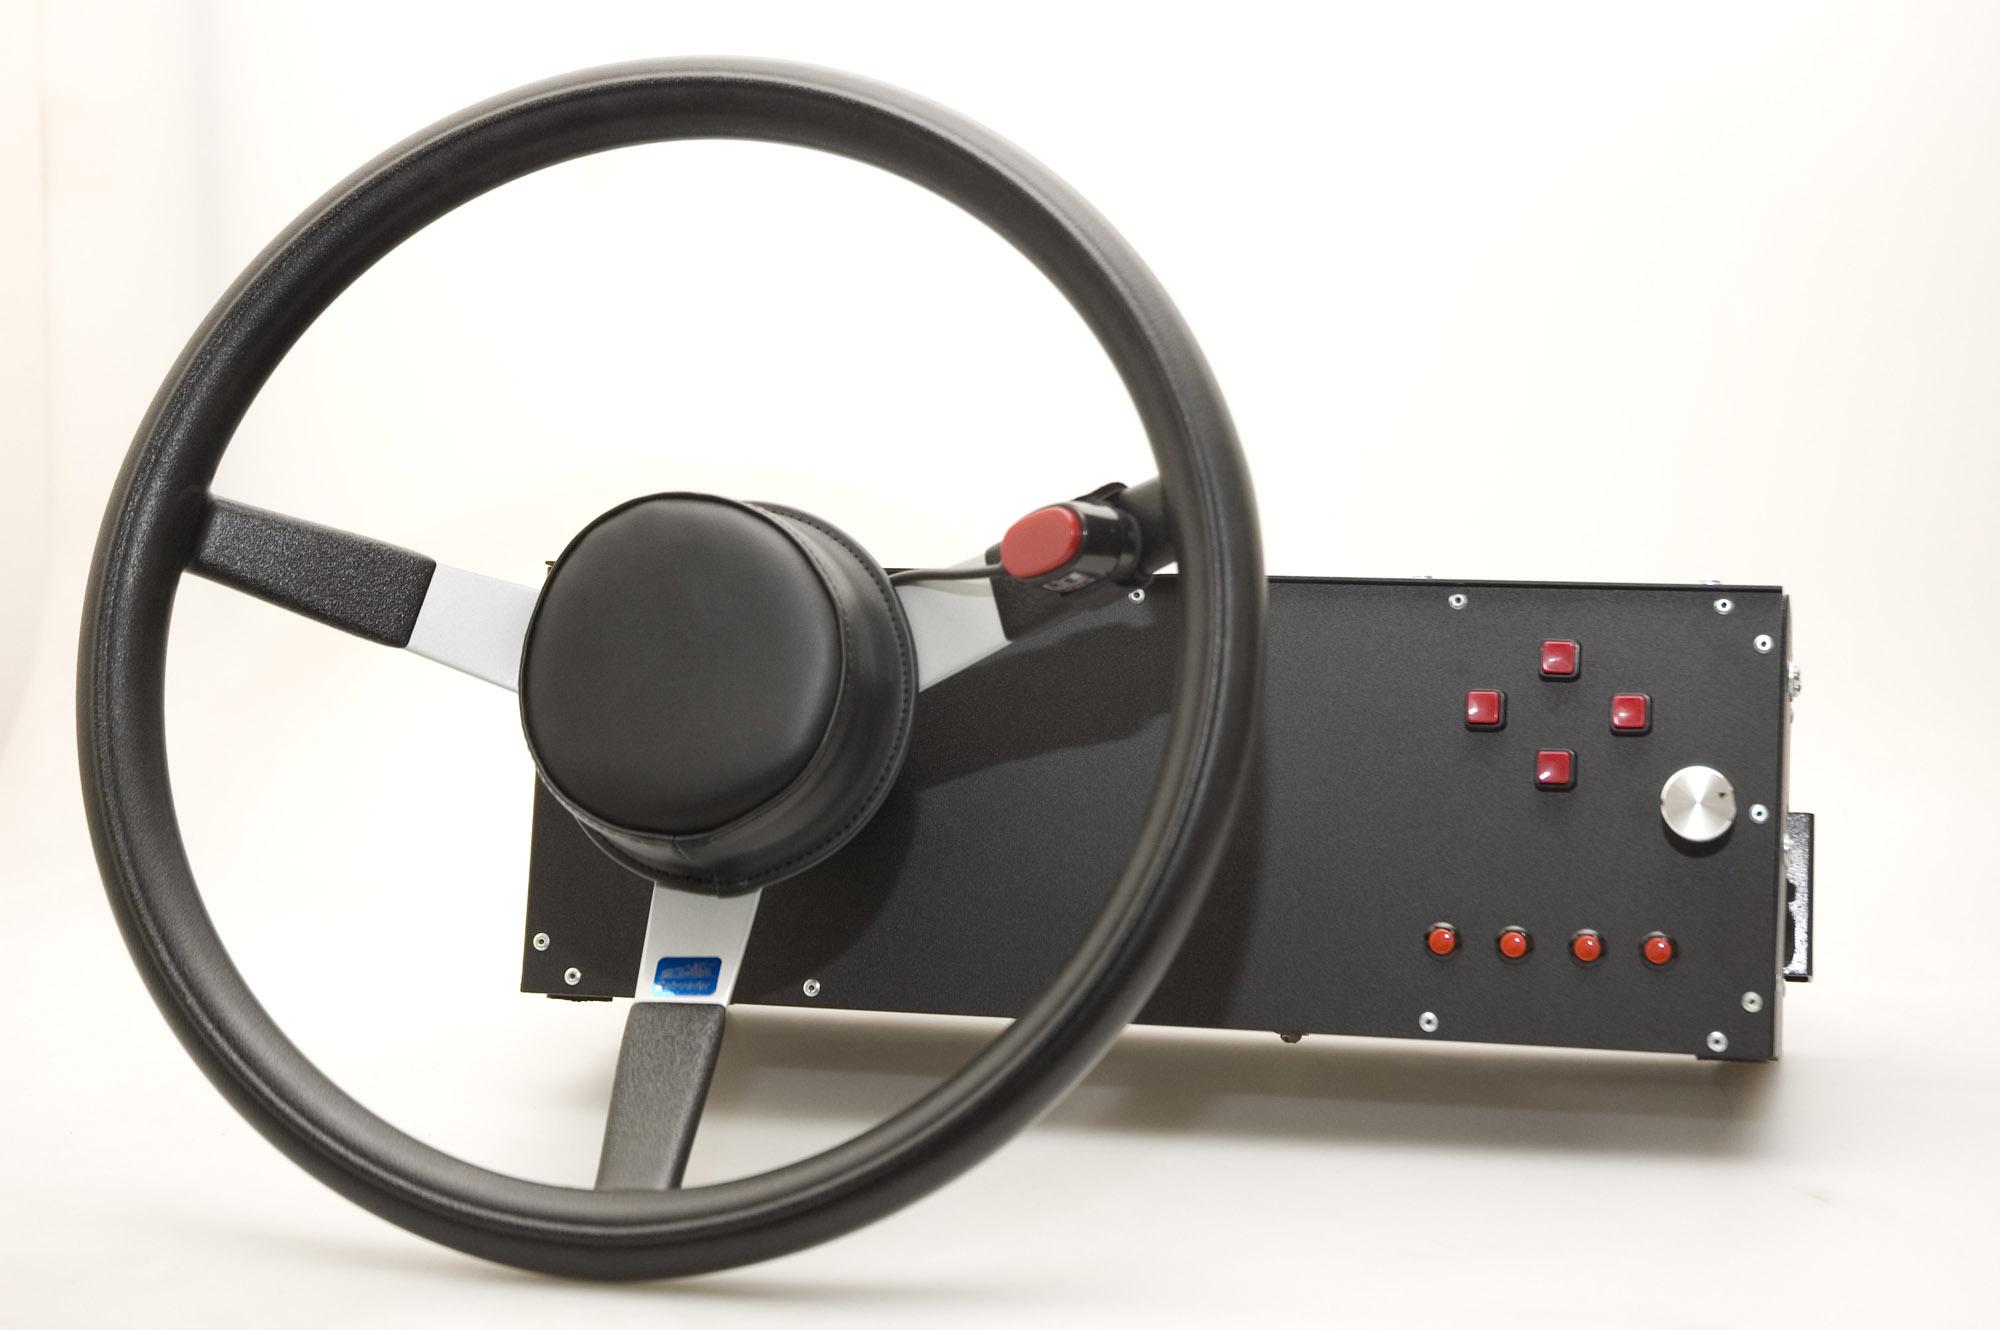 gorilla customs r series pro steering wheel unveiled. Black Bedroom Furniture Sets. Home Design Ideas